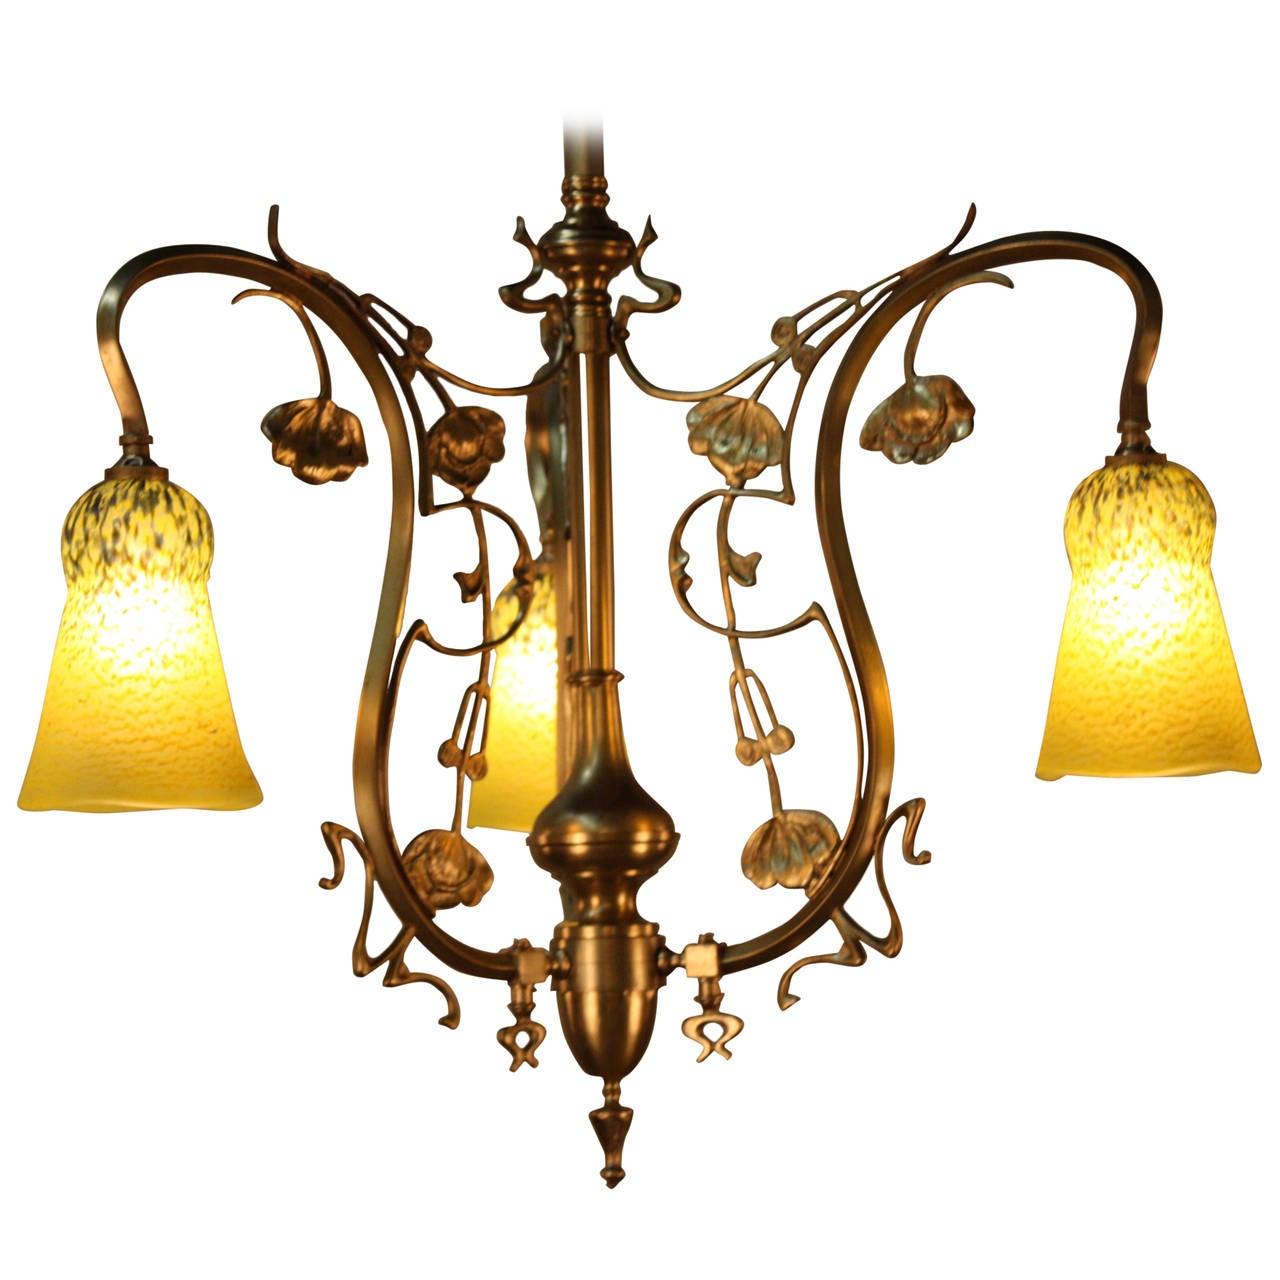 French electrified gas art nouveau chandelier at 1stdibs for Chandelier art nouveau